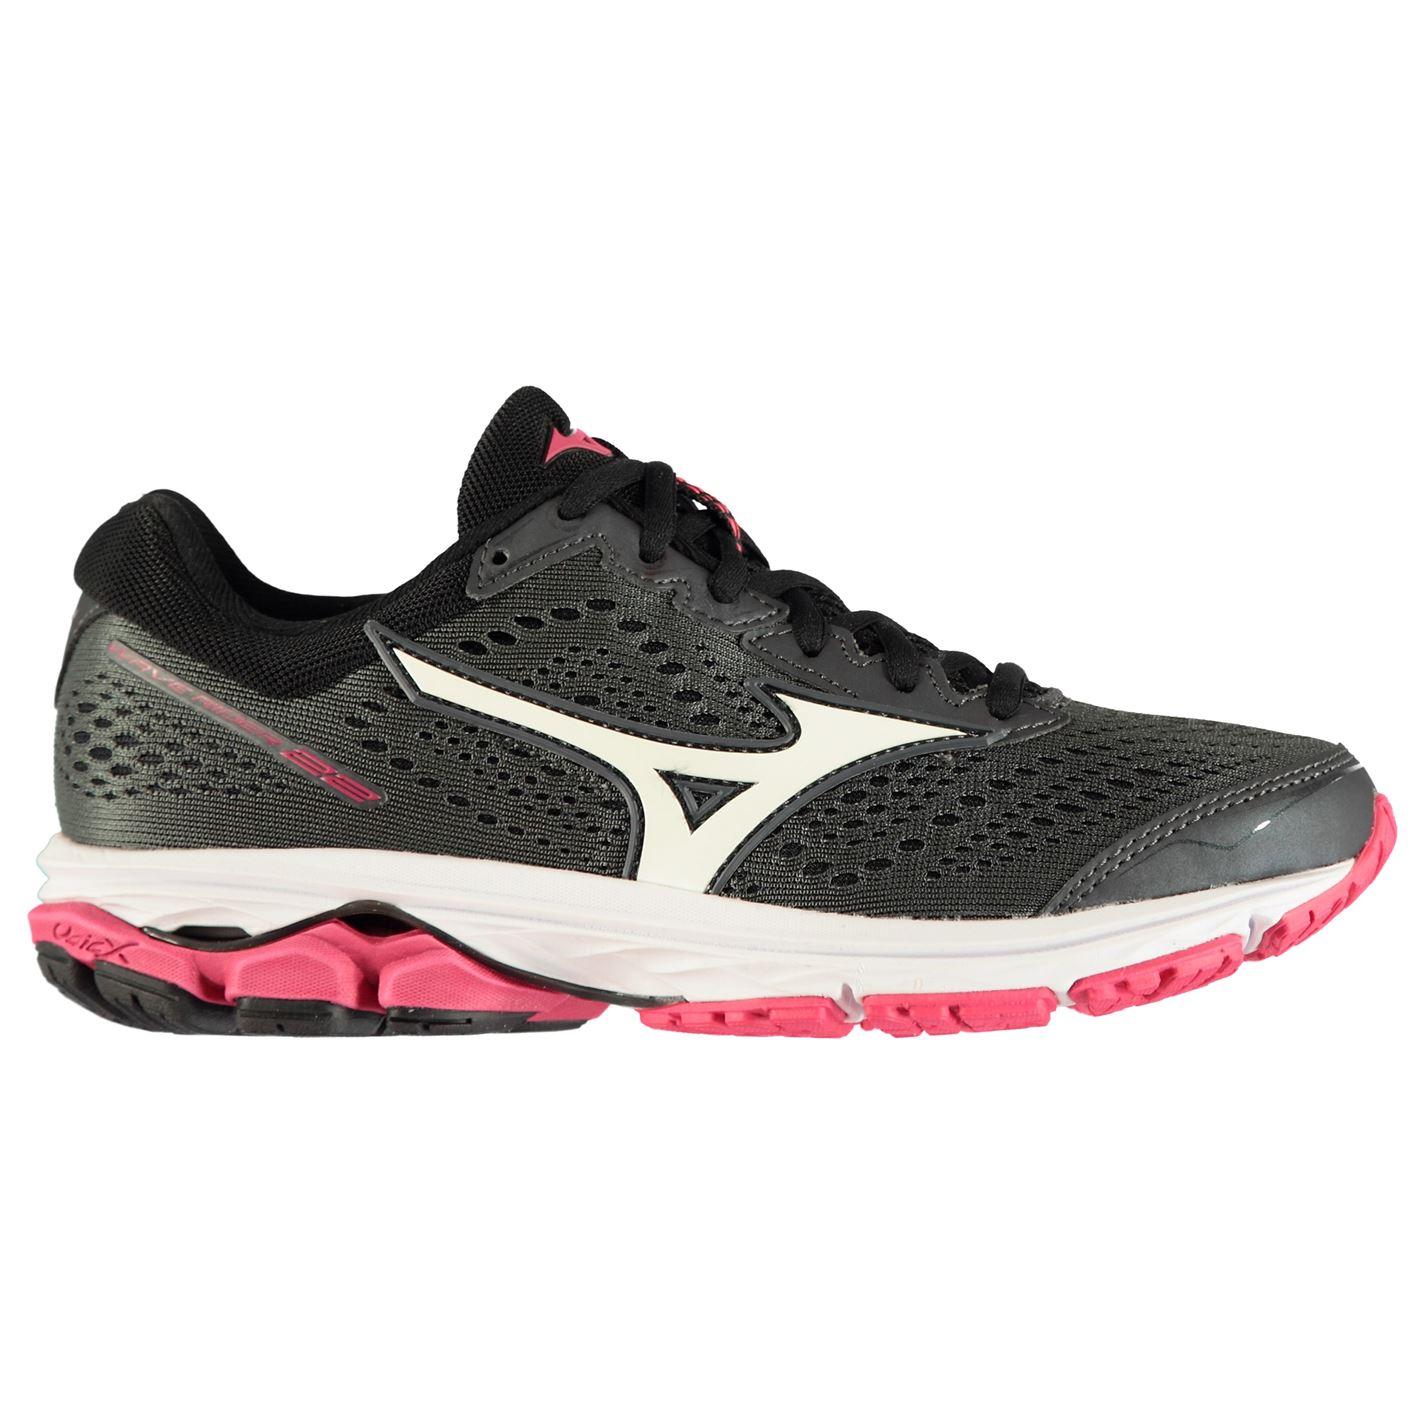 boty Mizuno Wave Rider 22 dámské Running Shoes